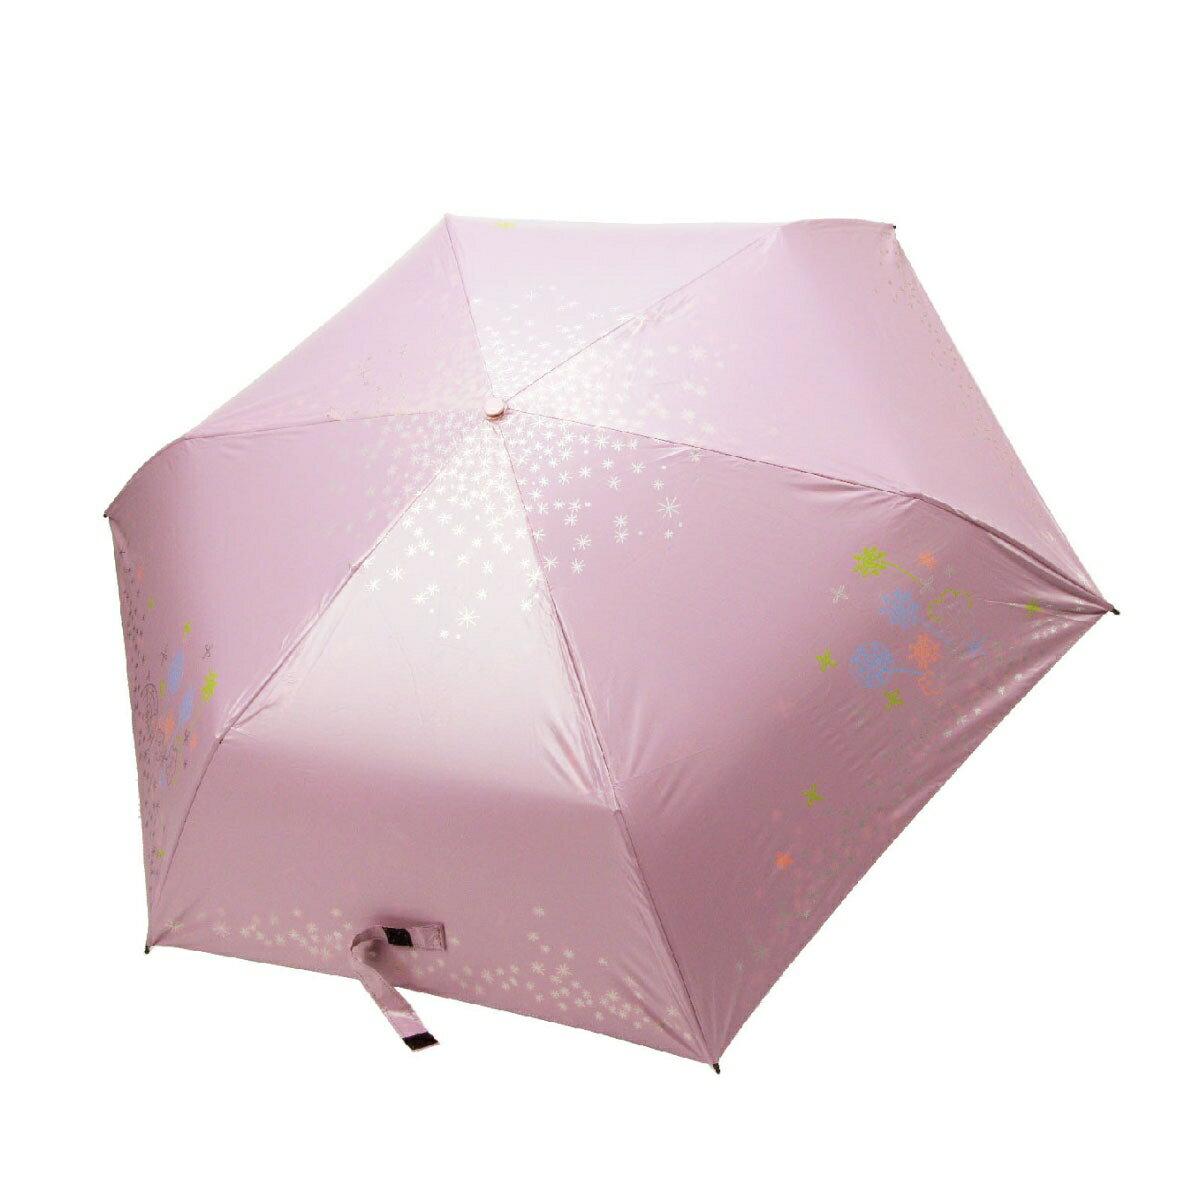 【iumbrella】棉花糖樂園紫外線變色自動傘-淡粉紅